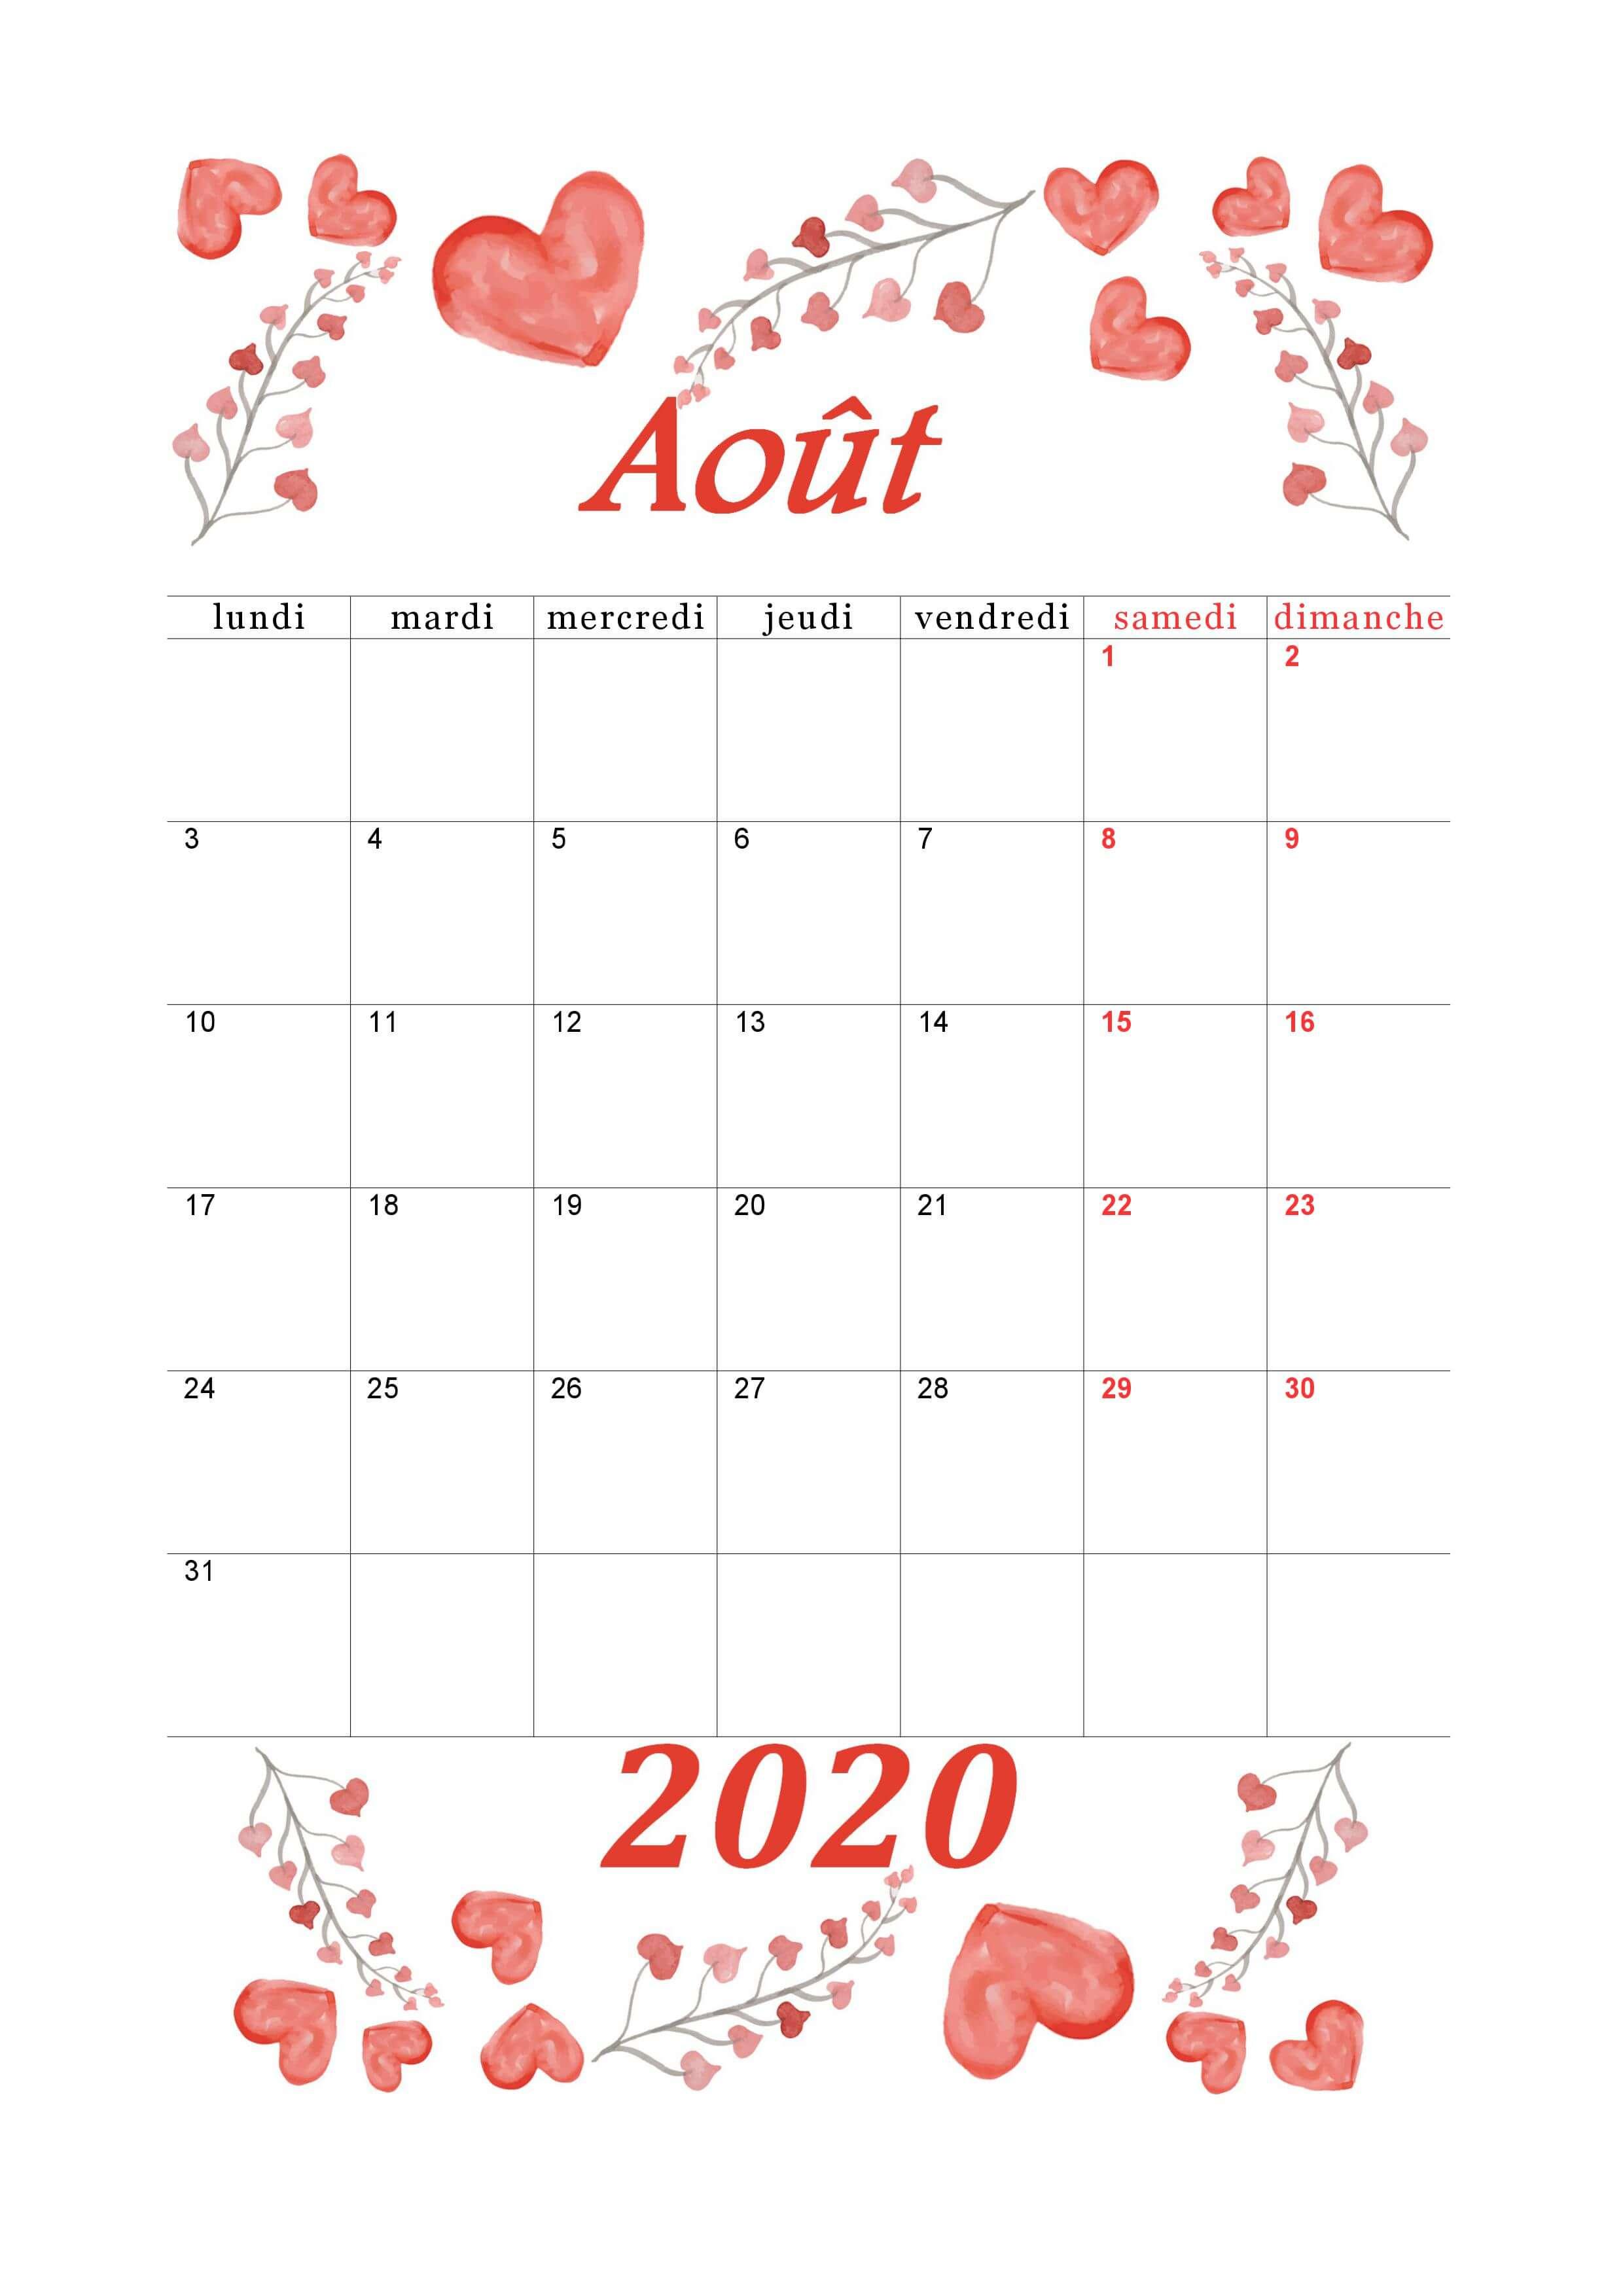 Calendrier Aout 2020 Floral